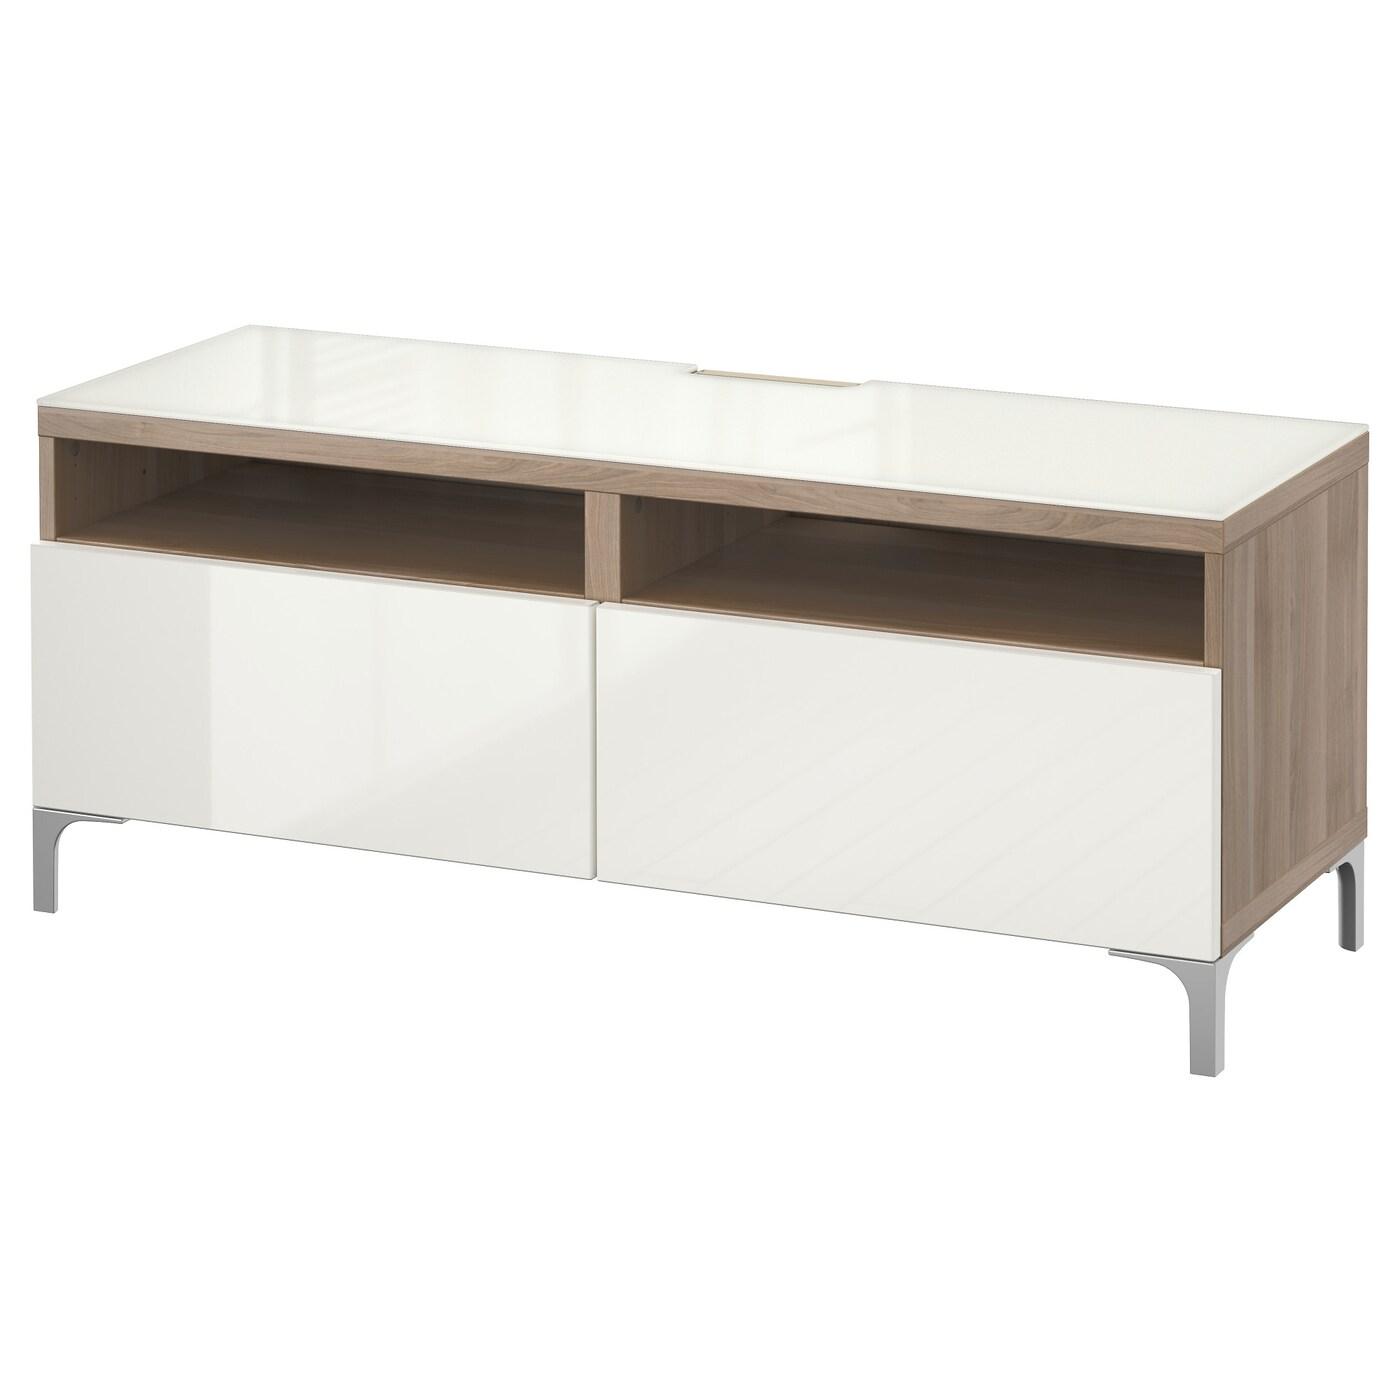 best banc tv avec tiroirs motif noyer teint gris selsviken brillant blanc 120x40x48 cm ikea. Black Bedroom Furniture Sets. Home Design Ideas